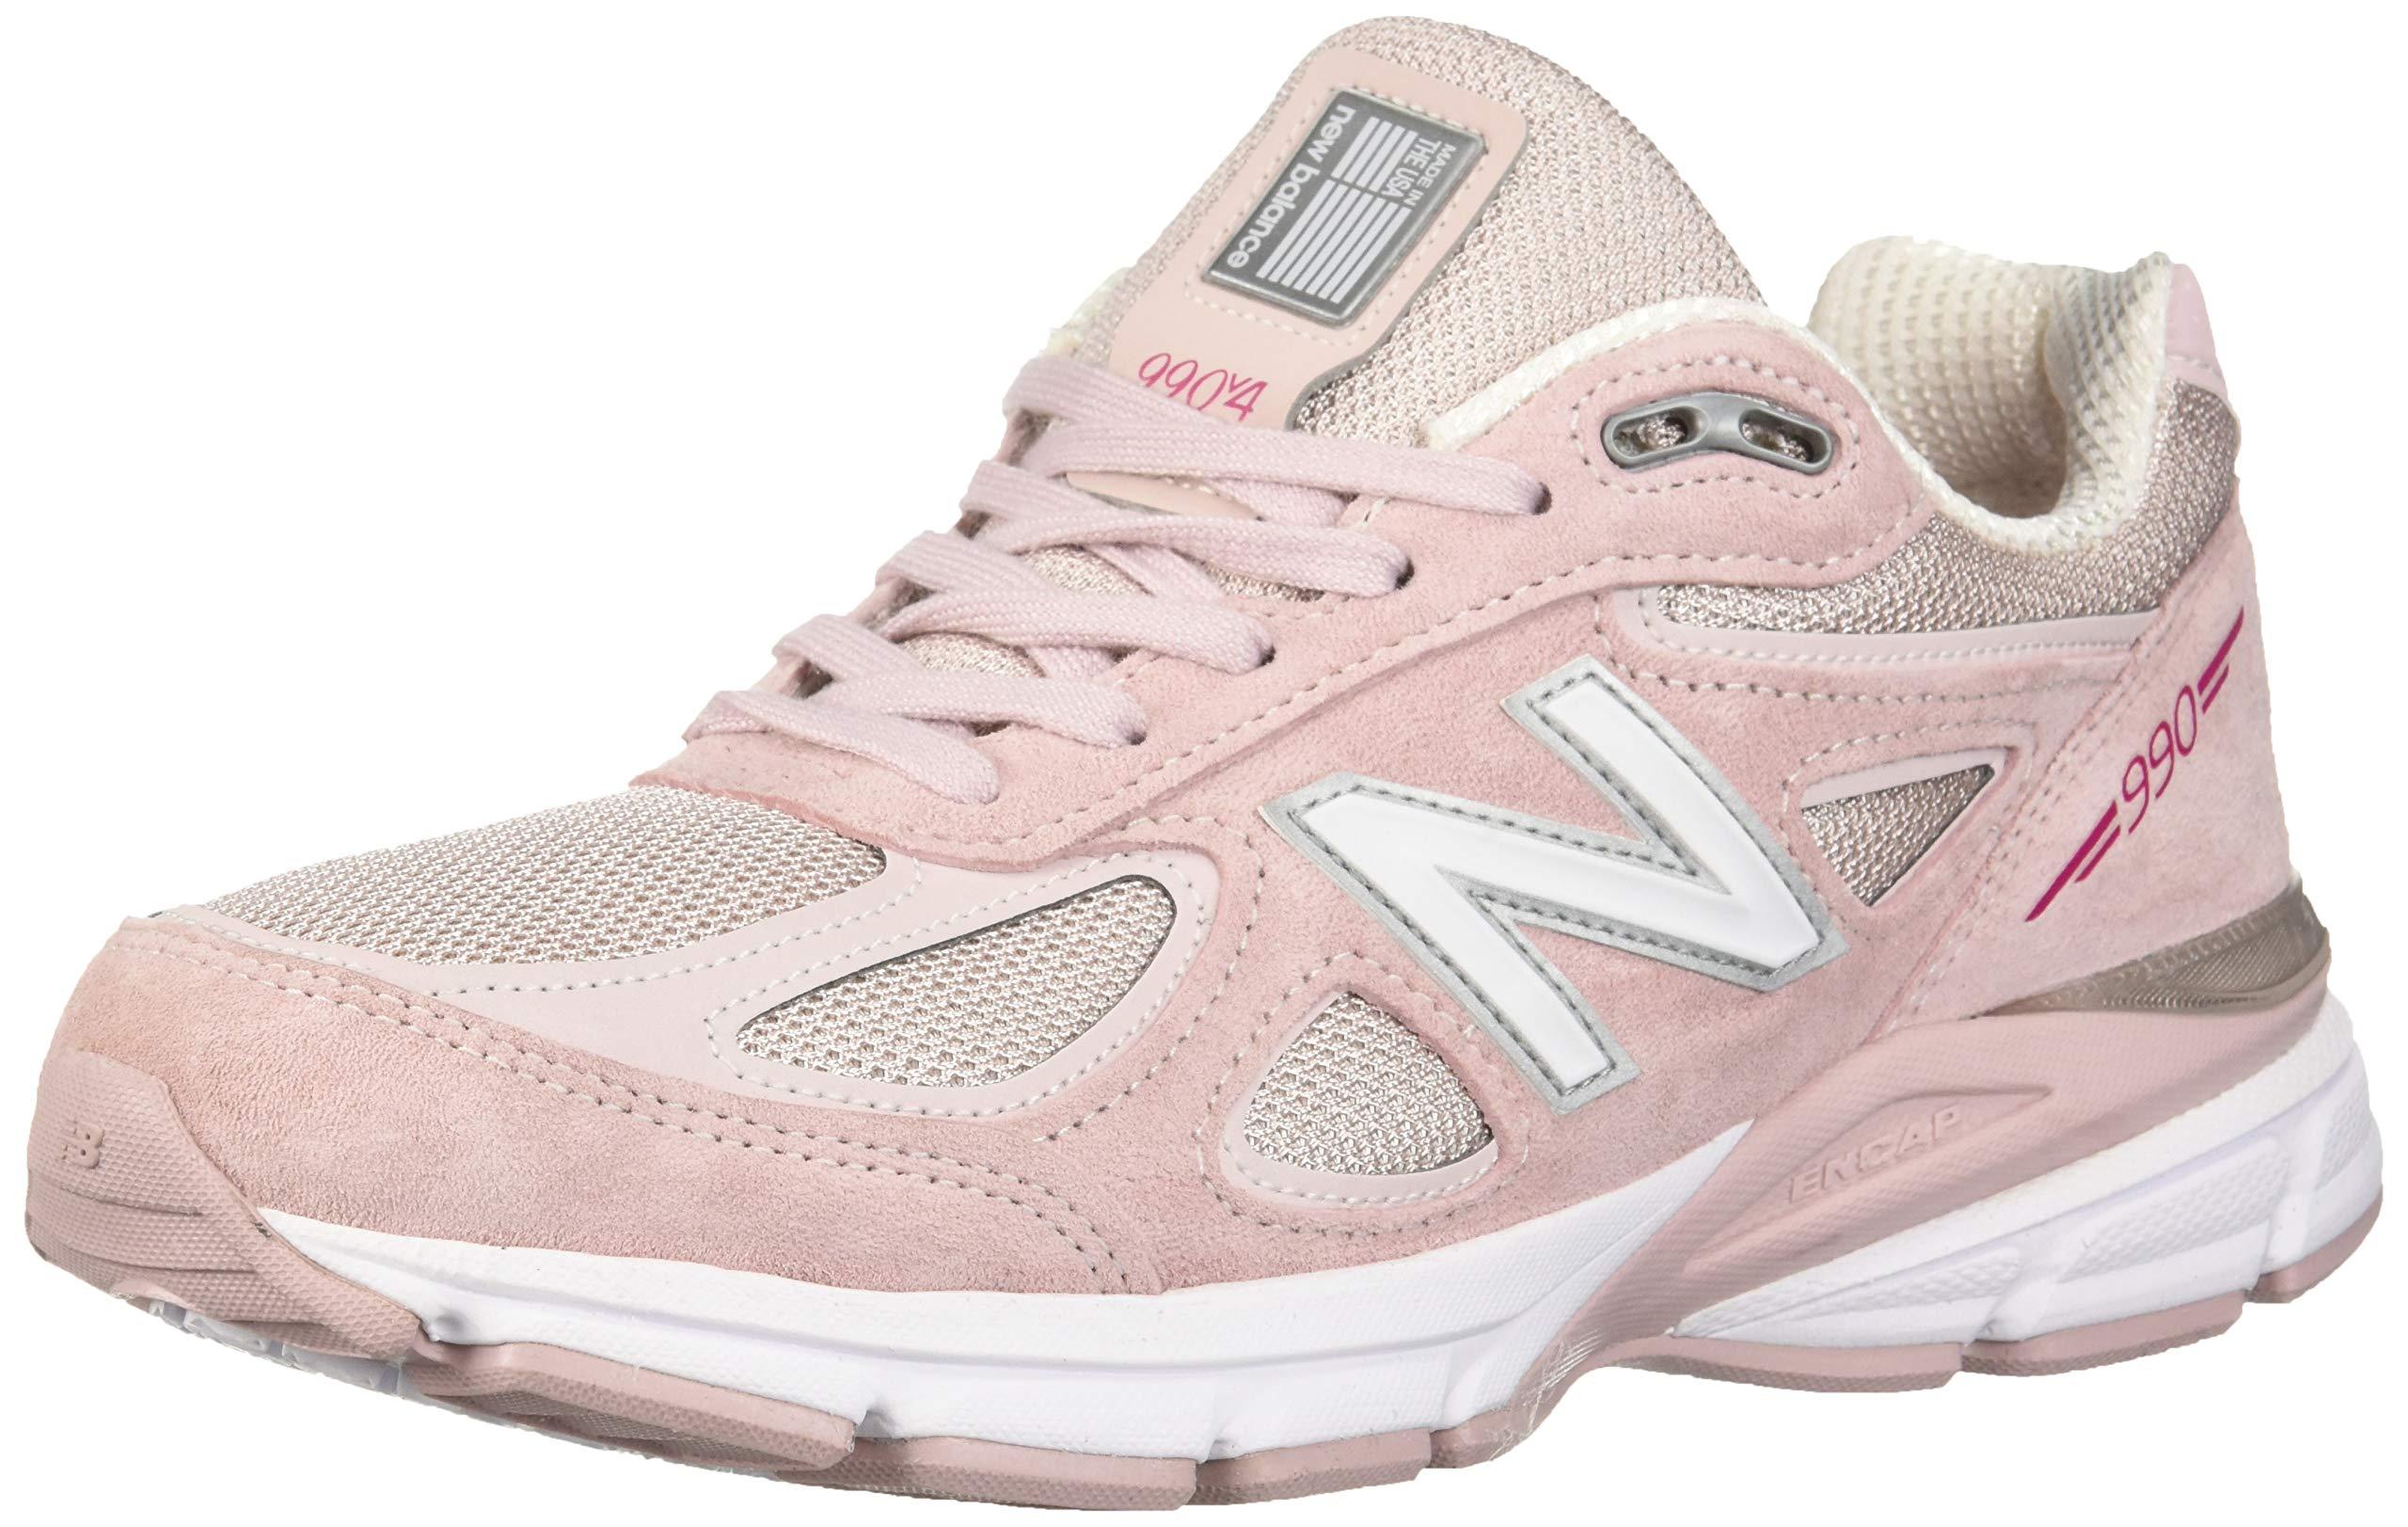 New Balance Men's 990v4 Running Shoe, Faded Rose/Komen Pink, 7 D US by New Balance (Image #1)